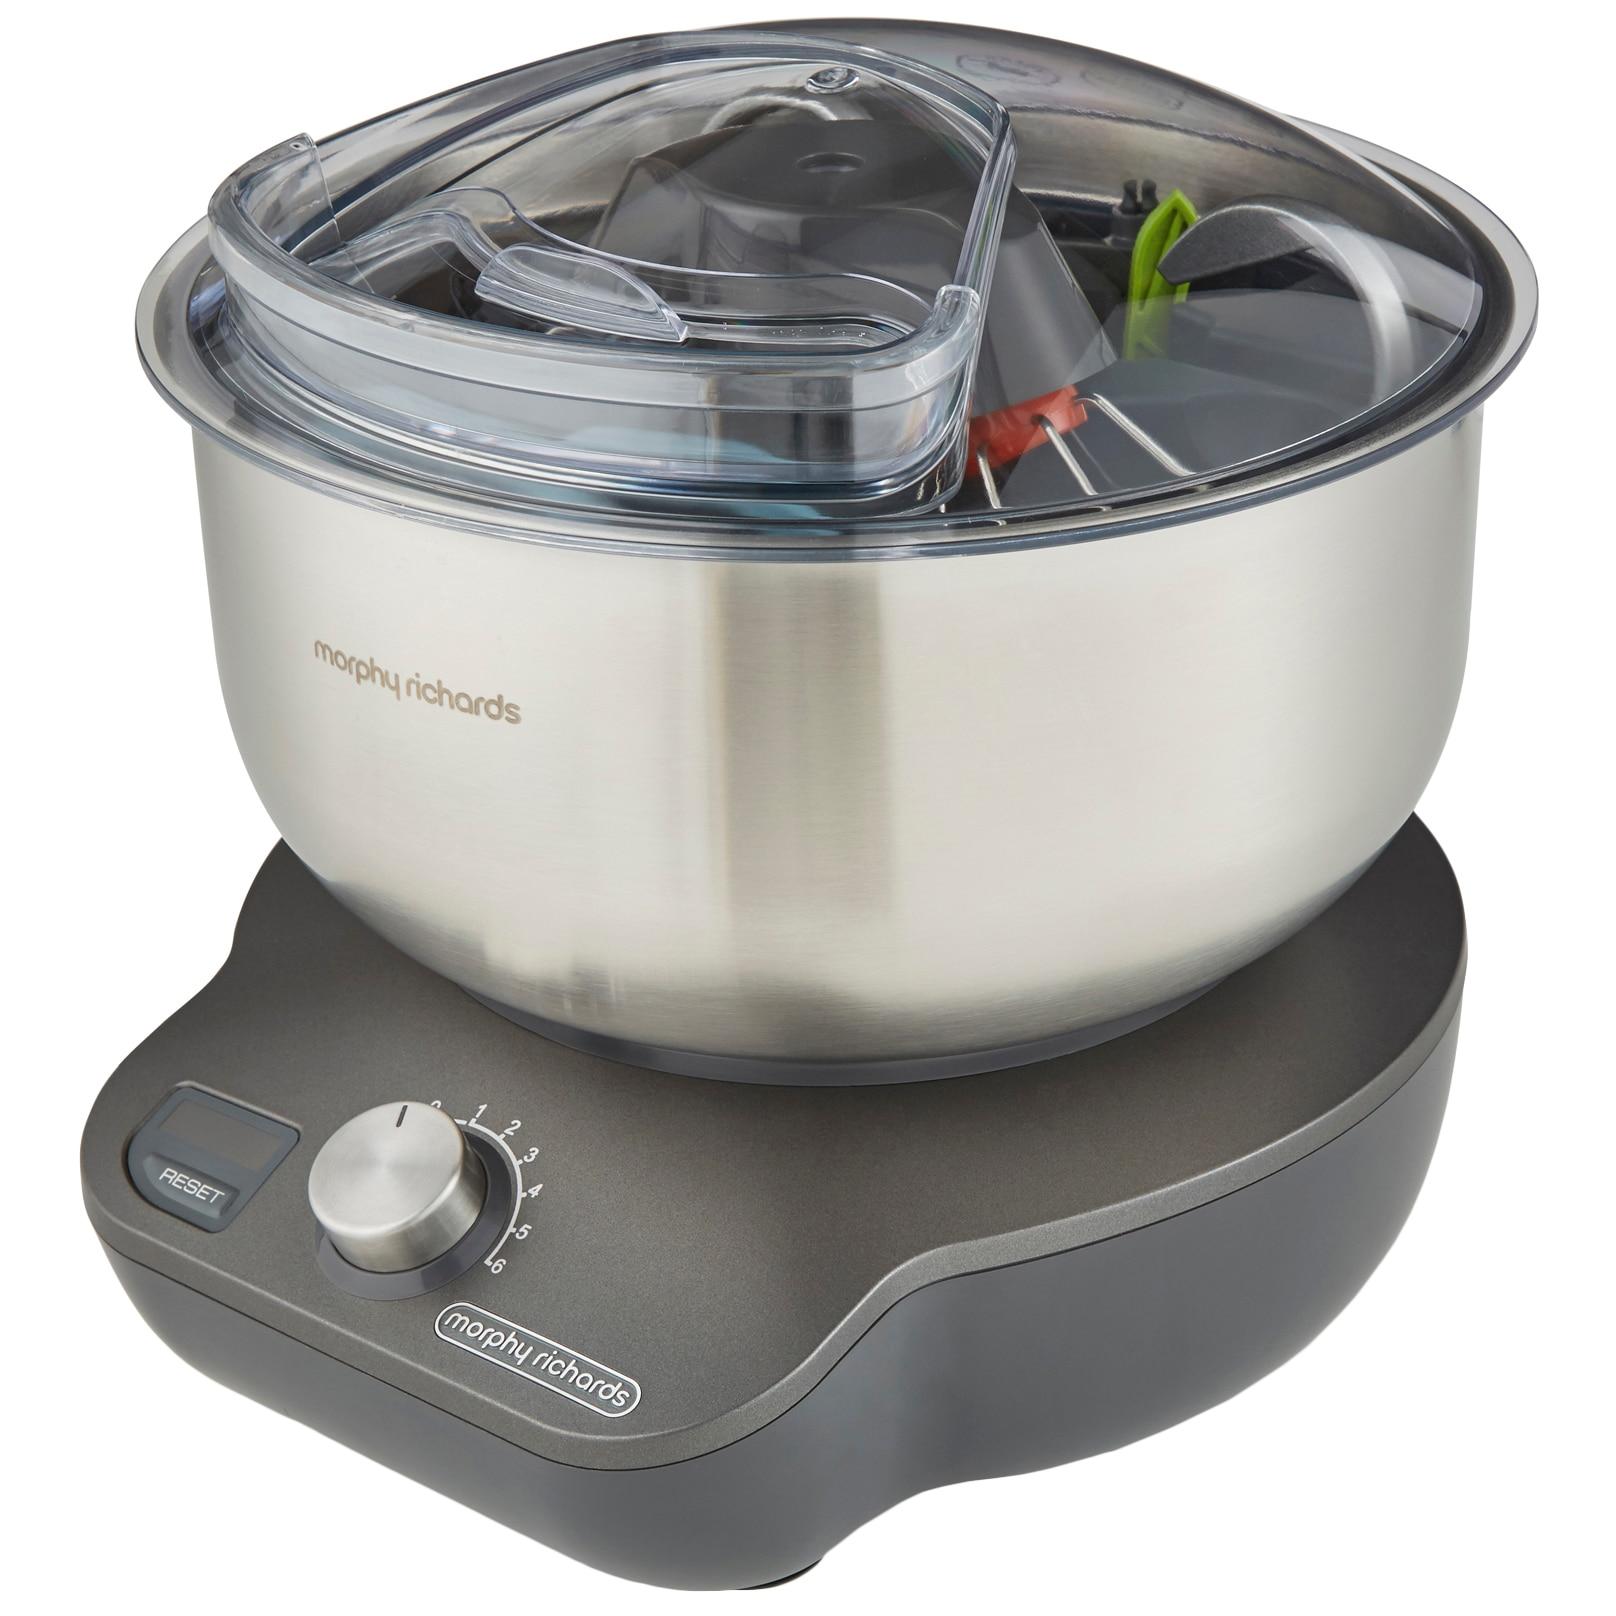 Fotografie Mixer cu bol Morphy Richards Mix Star 400520, compact, 650W, vas inox 5 litri, 6 trepte de viteza, Inox